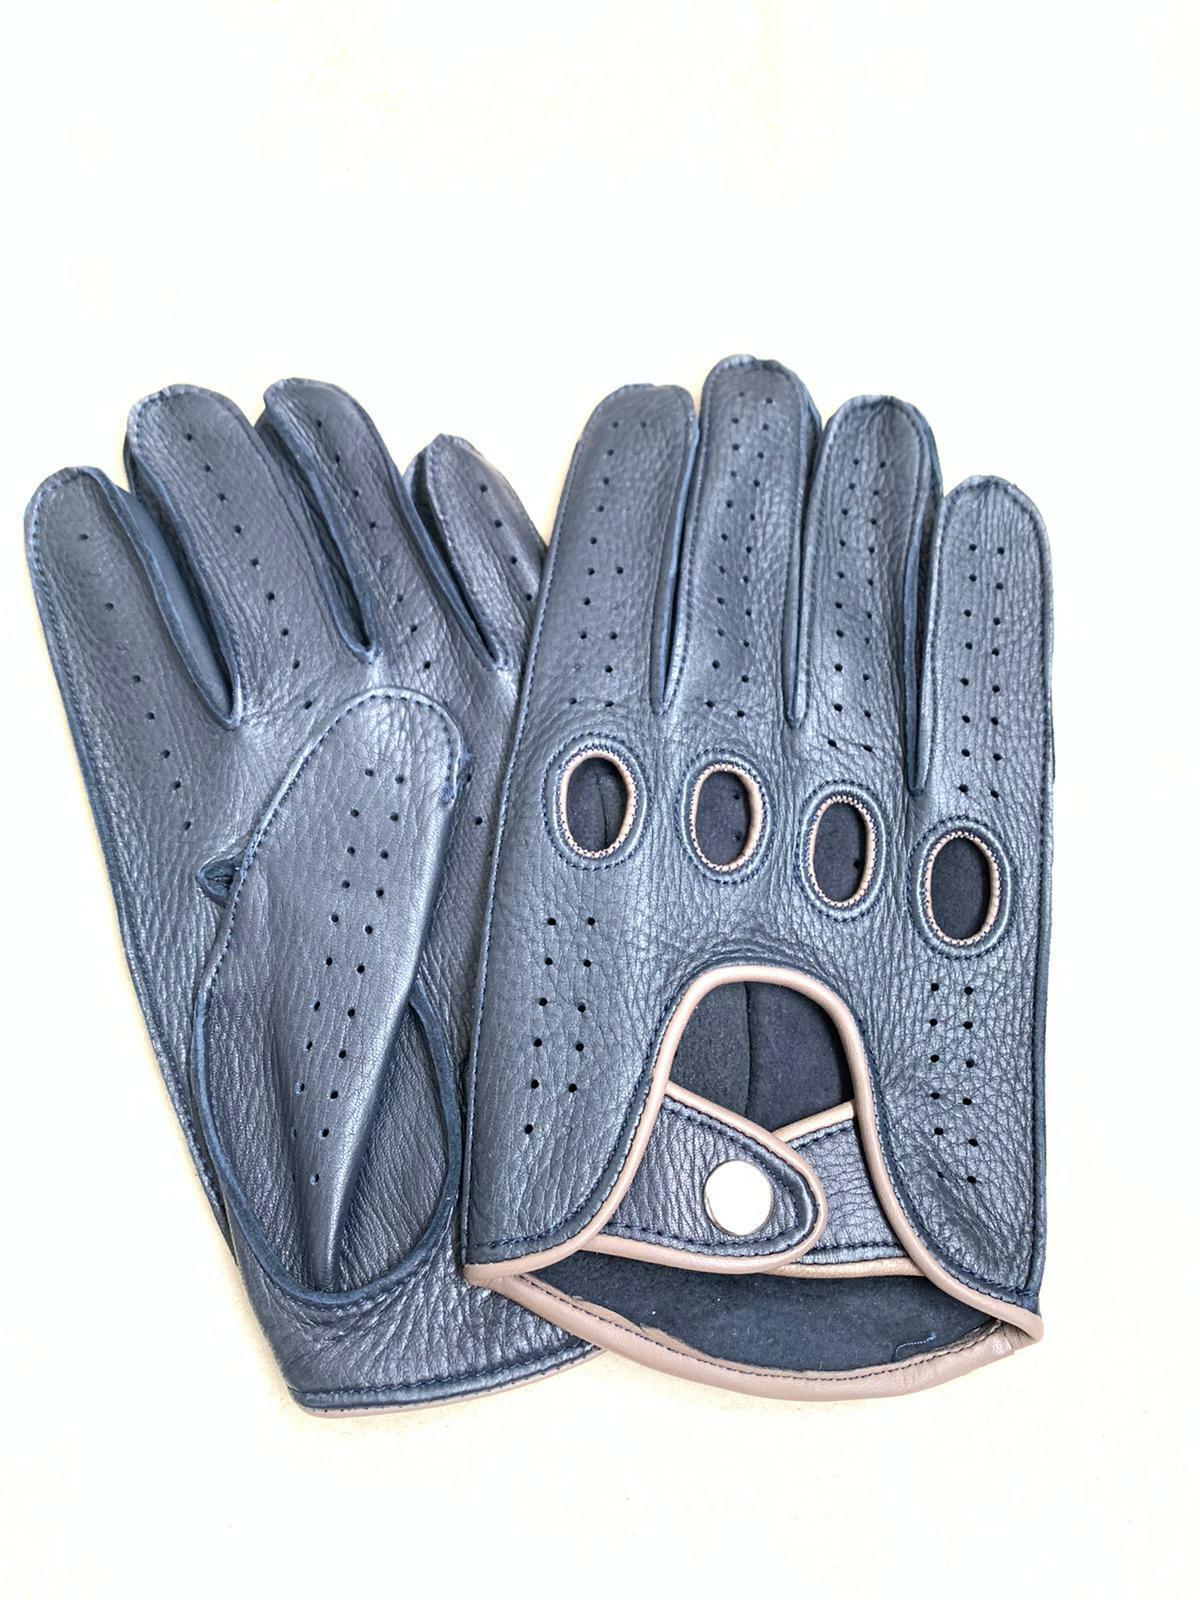 Men's Driving Deerskin Blue & Grey Contoured Gloves